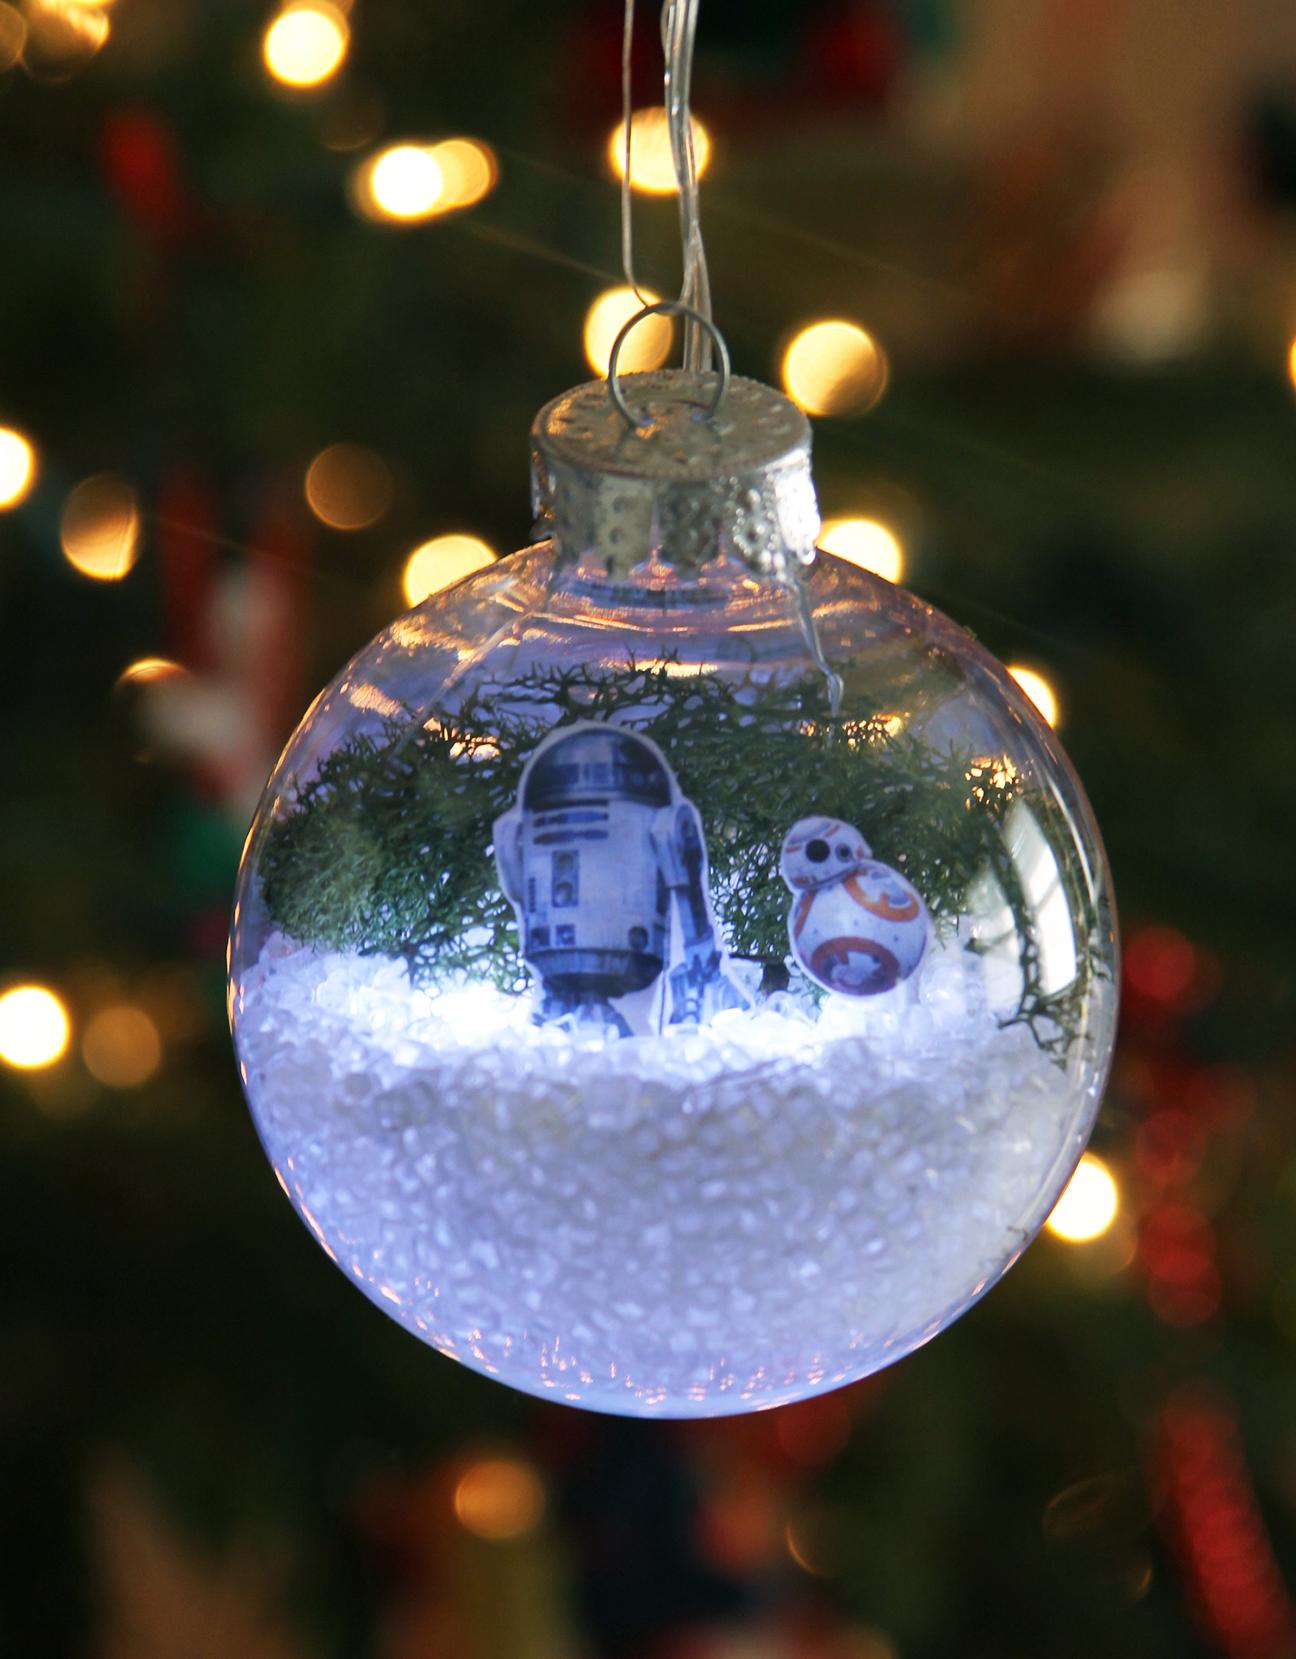 Diy star wars glowing snow globe holiday ornament